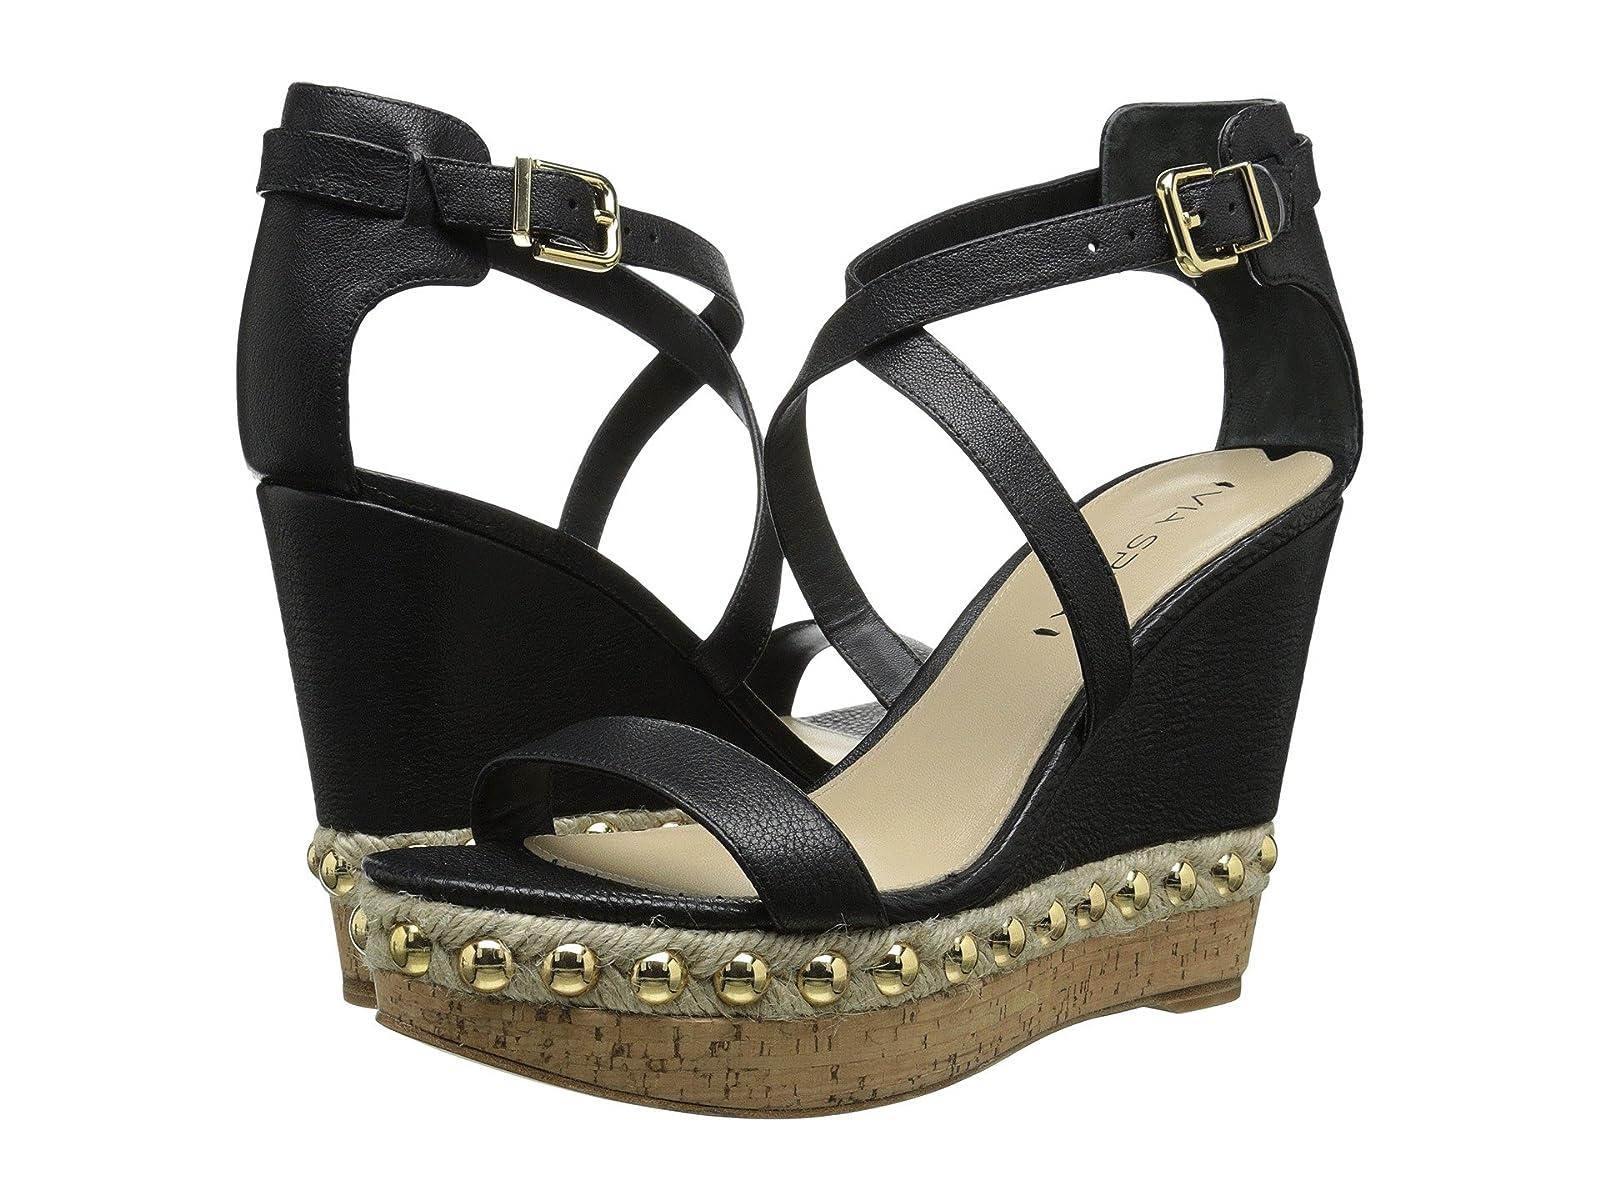 Via Spiga MossCheap and distinctive eye-catching shoes